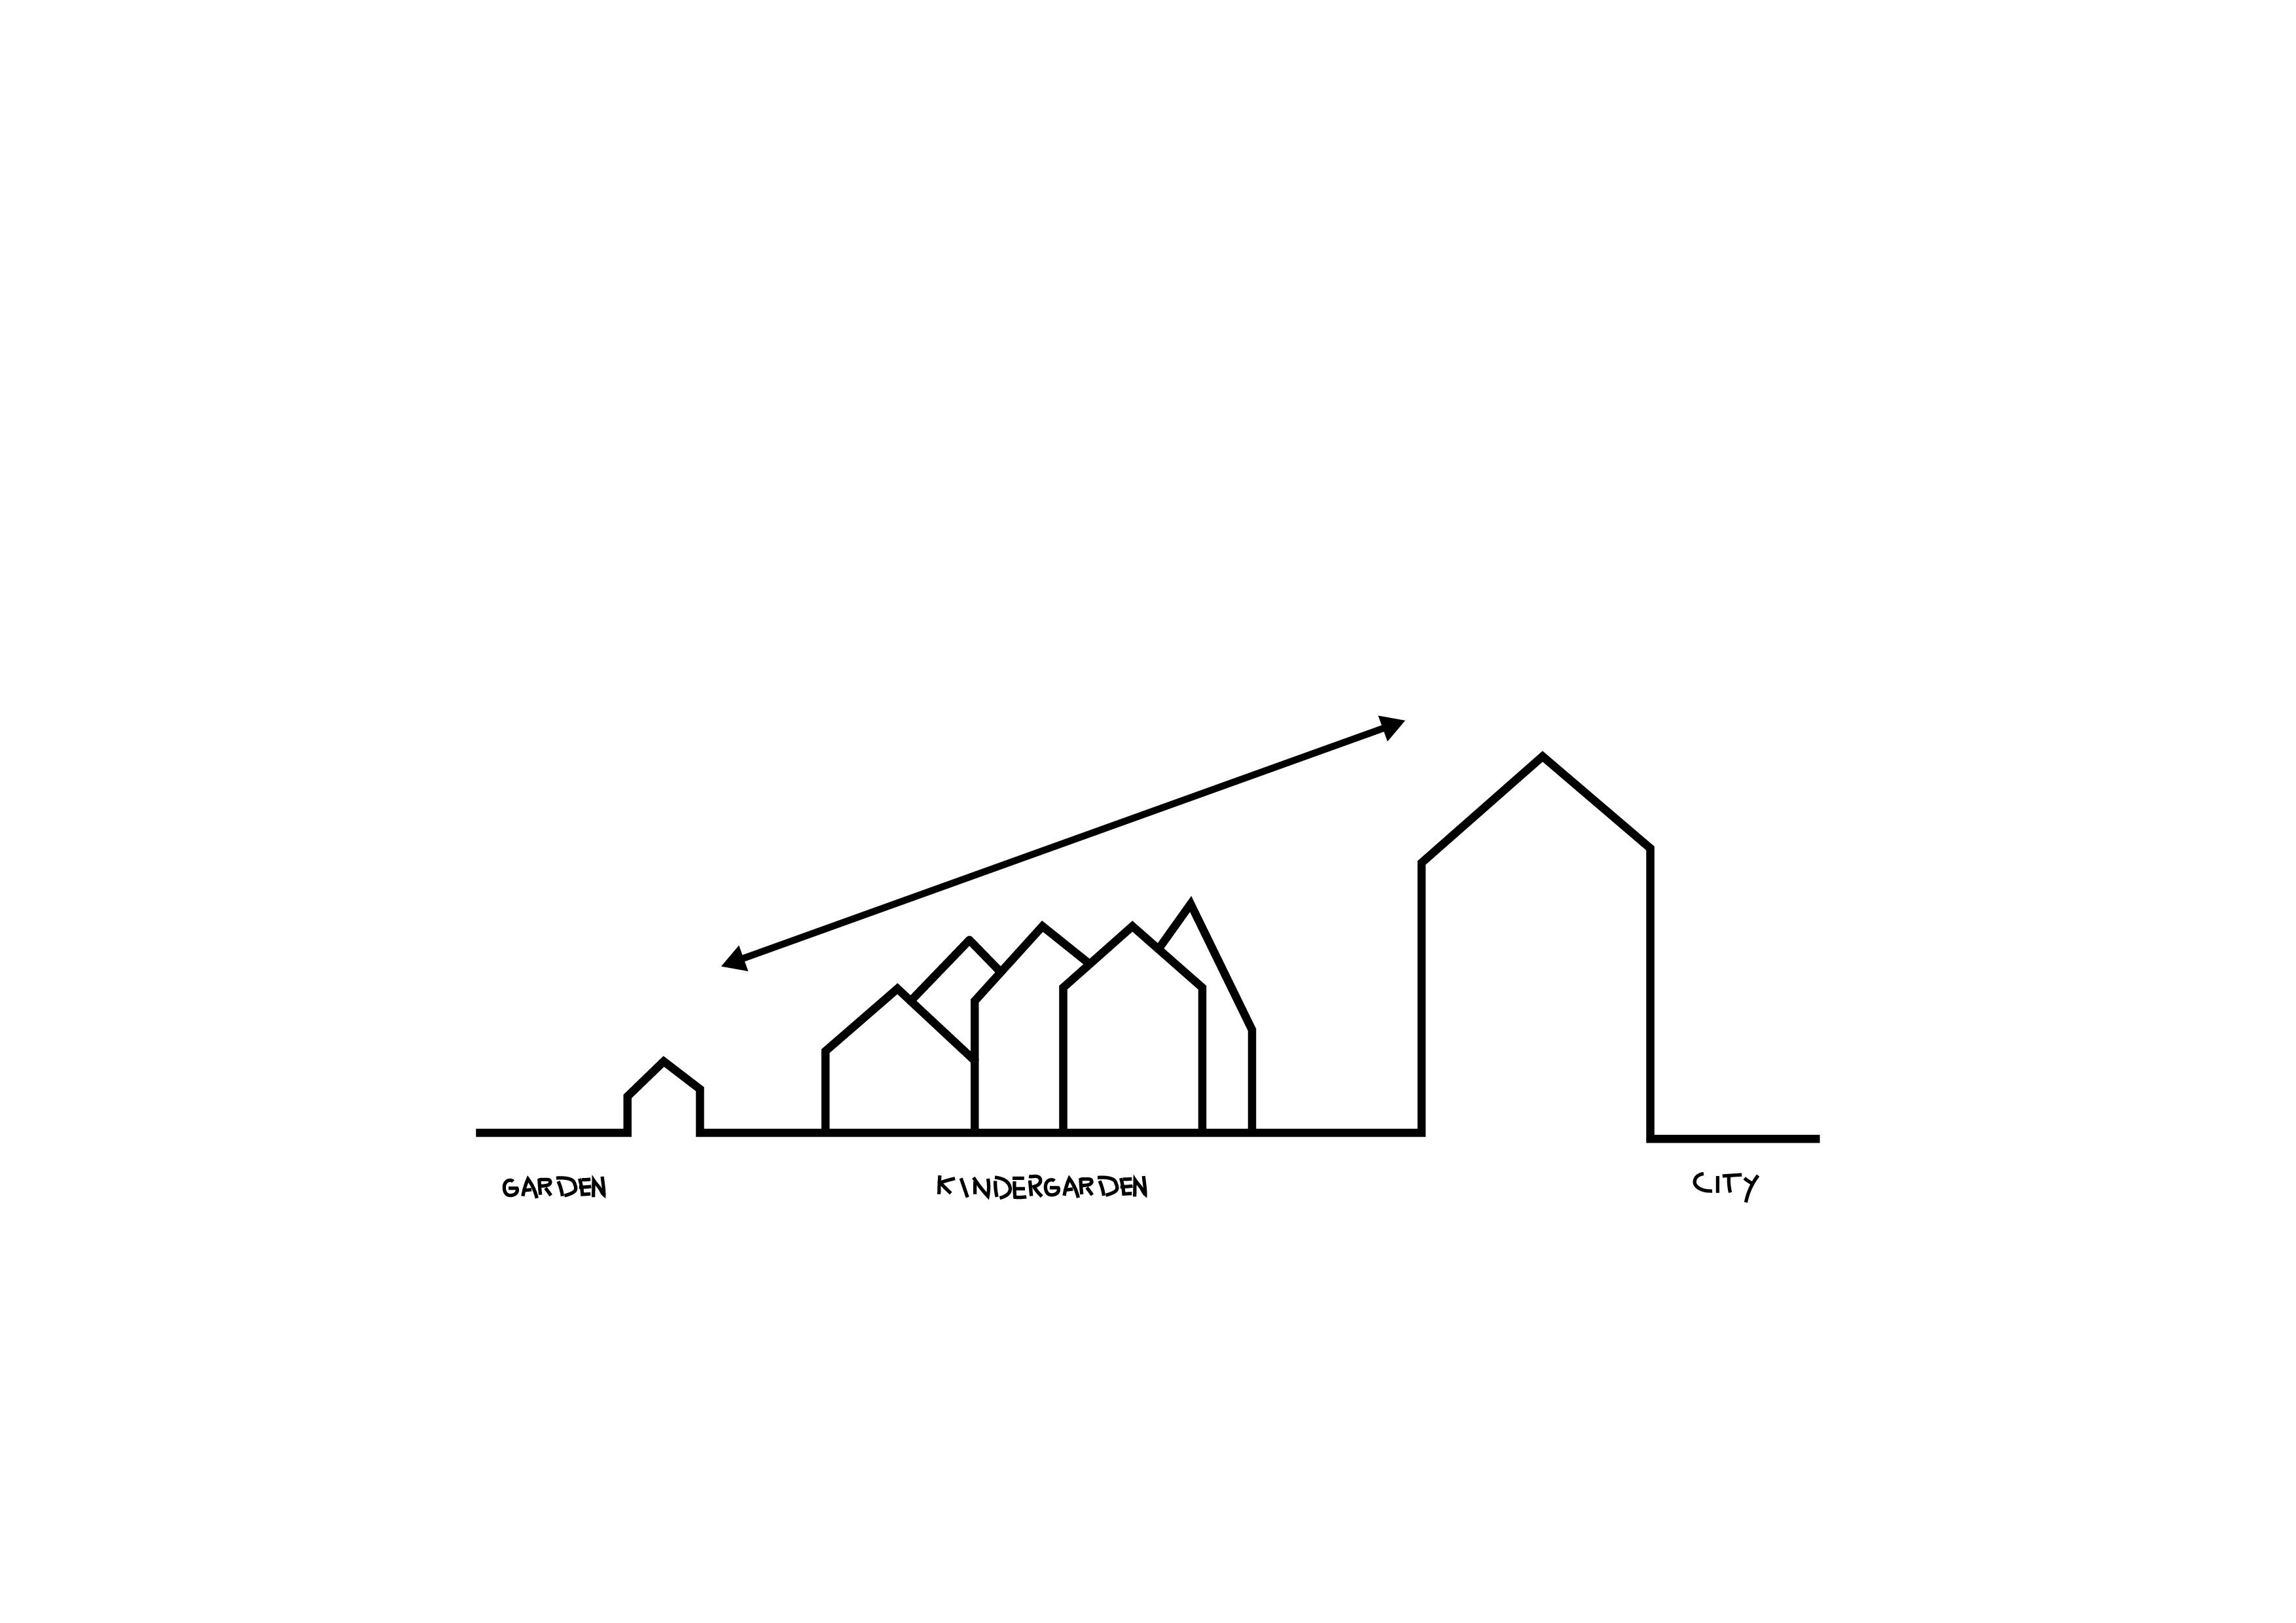 Frederiksvej Kindergarten_diagram 02_small meets large - the building adapts to the scale jump between garden & city_credit COBE